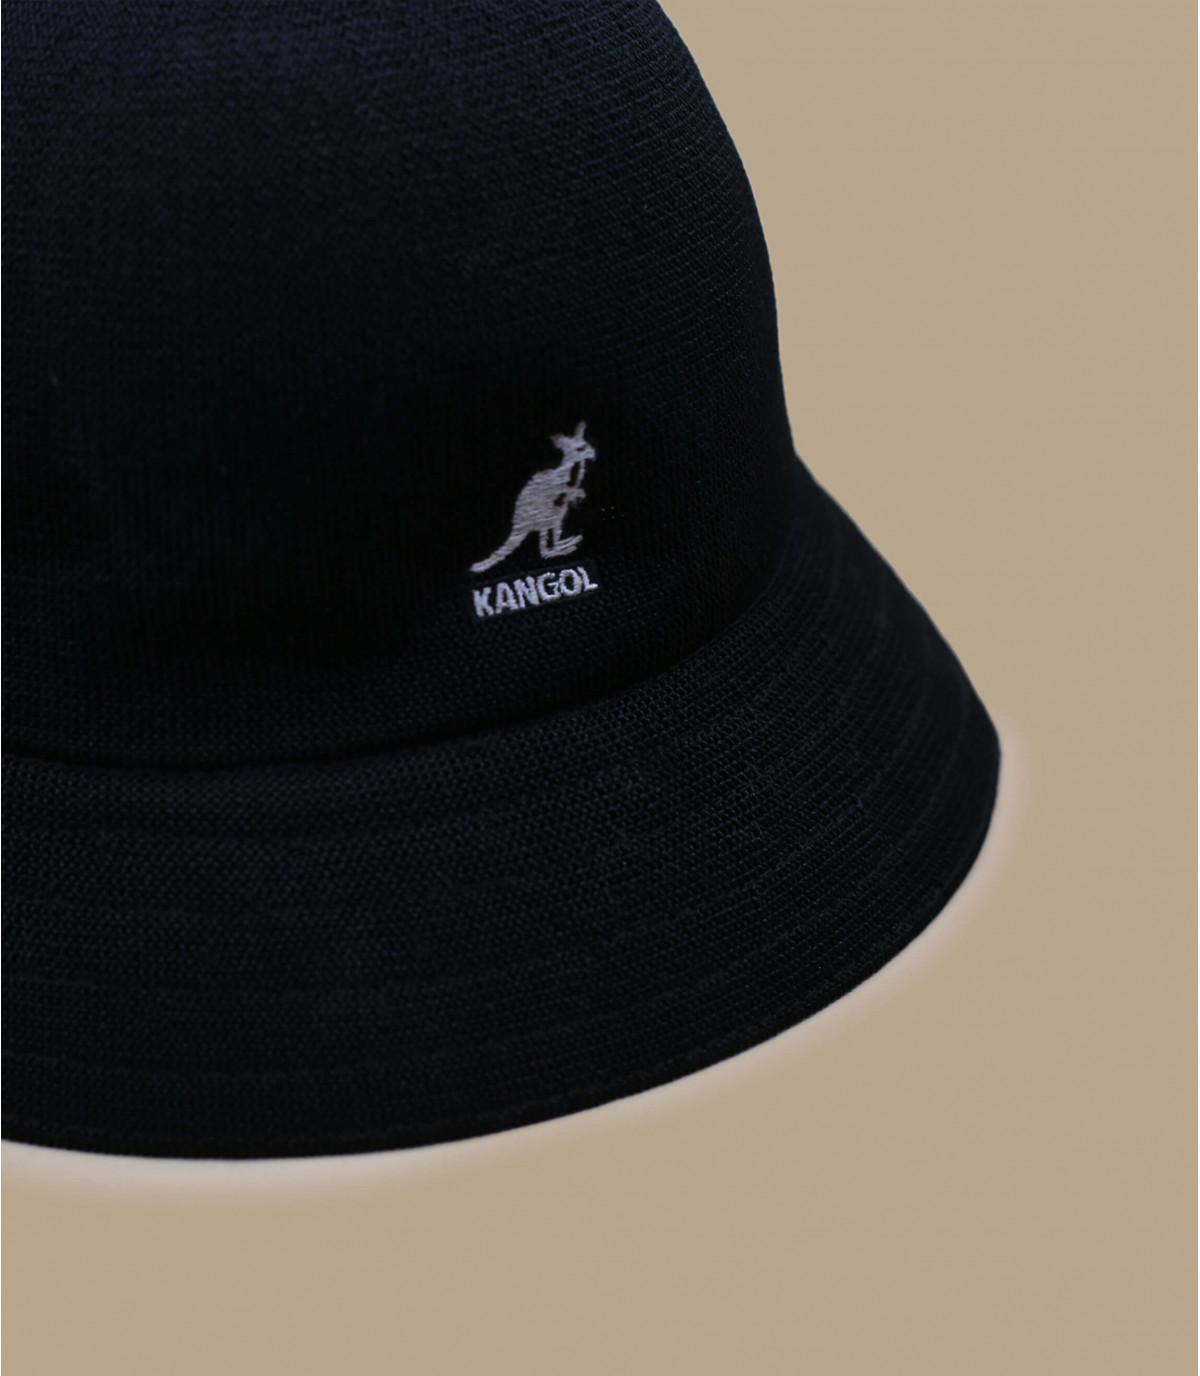 Kangol black Tropic bucket - Tropic casual black by Kangol. 9083ea88576